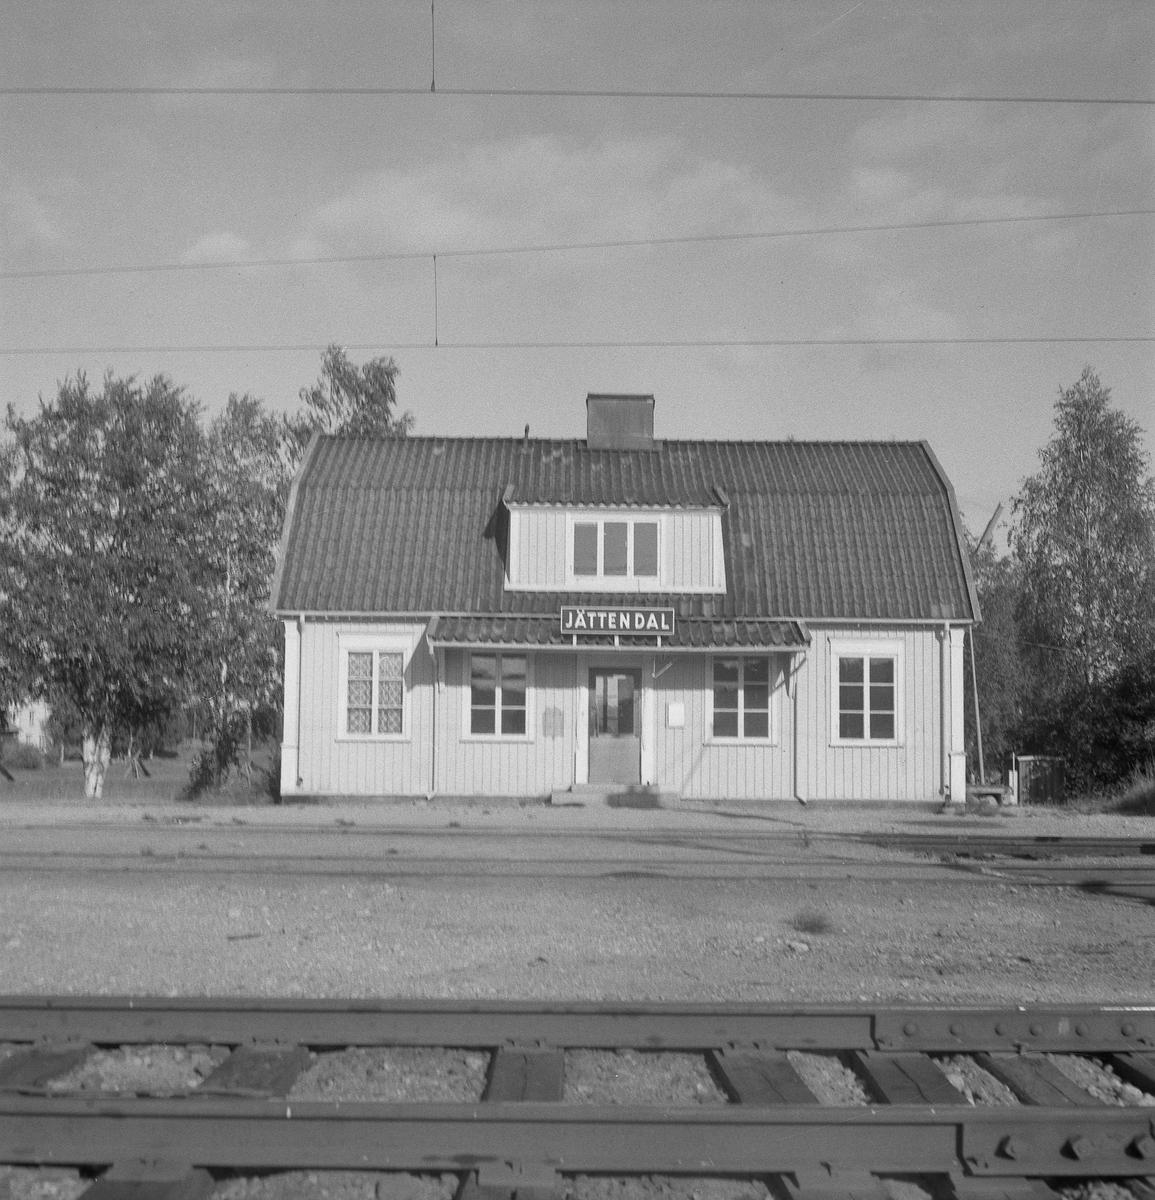 Jättendal station